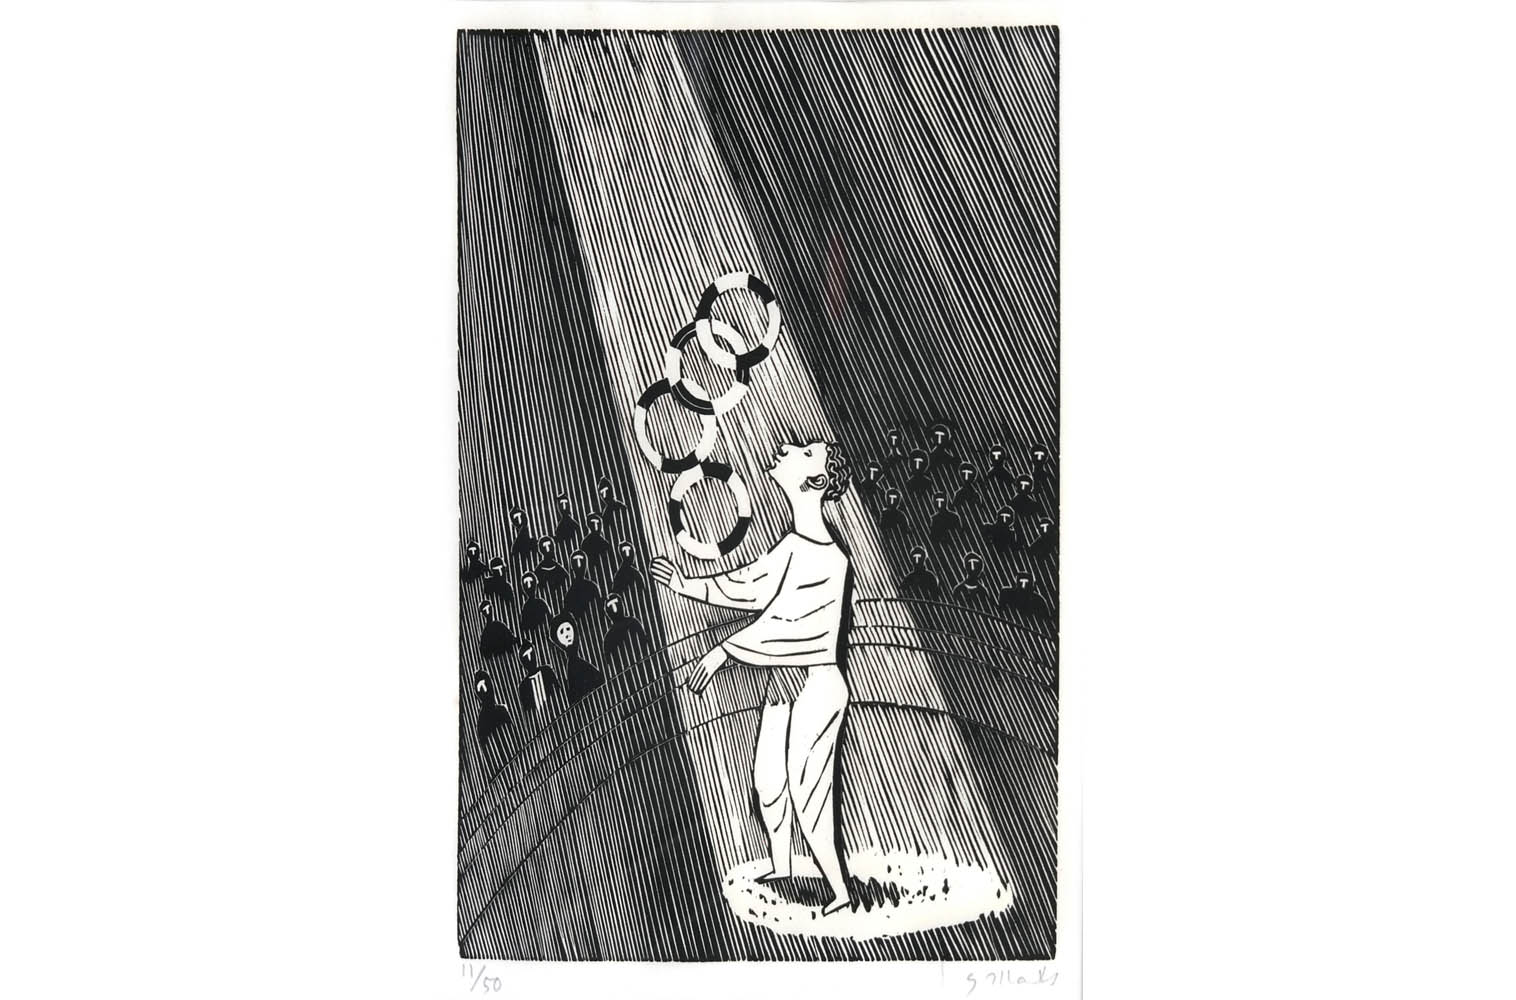 "Gerhard Marcks (1889-1981 ) "" Jongleur "" Holzschnitt auf Japanpapier, 1956 sign. und num. 17/50 Lammek H 270. 30,1 x 22 cm 410 €"